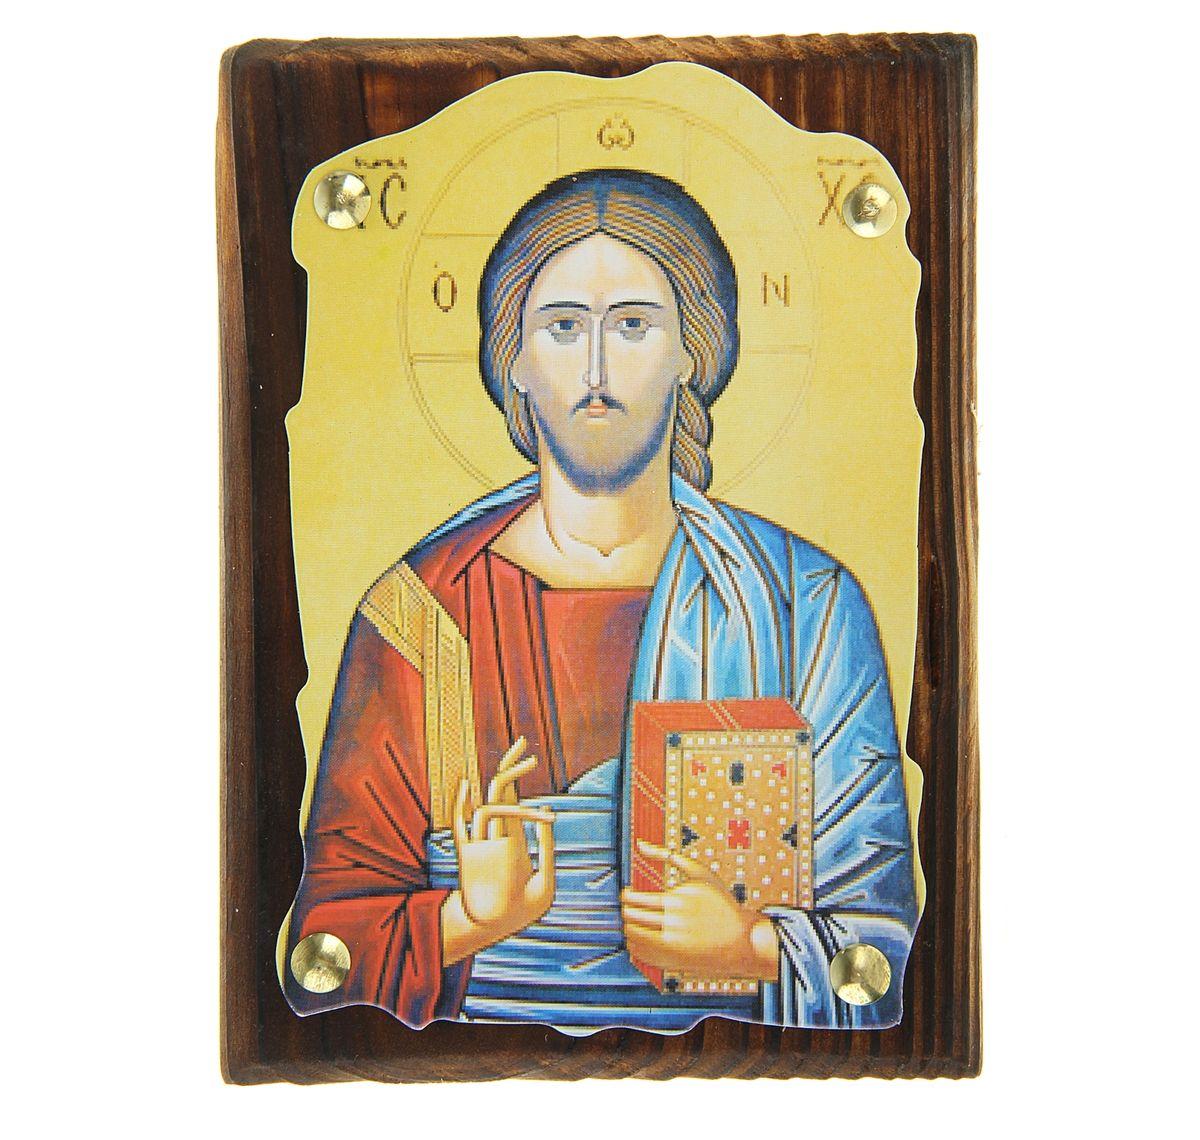 Икона Иисус Христос, 10,5 х 14,5 см